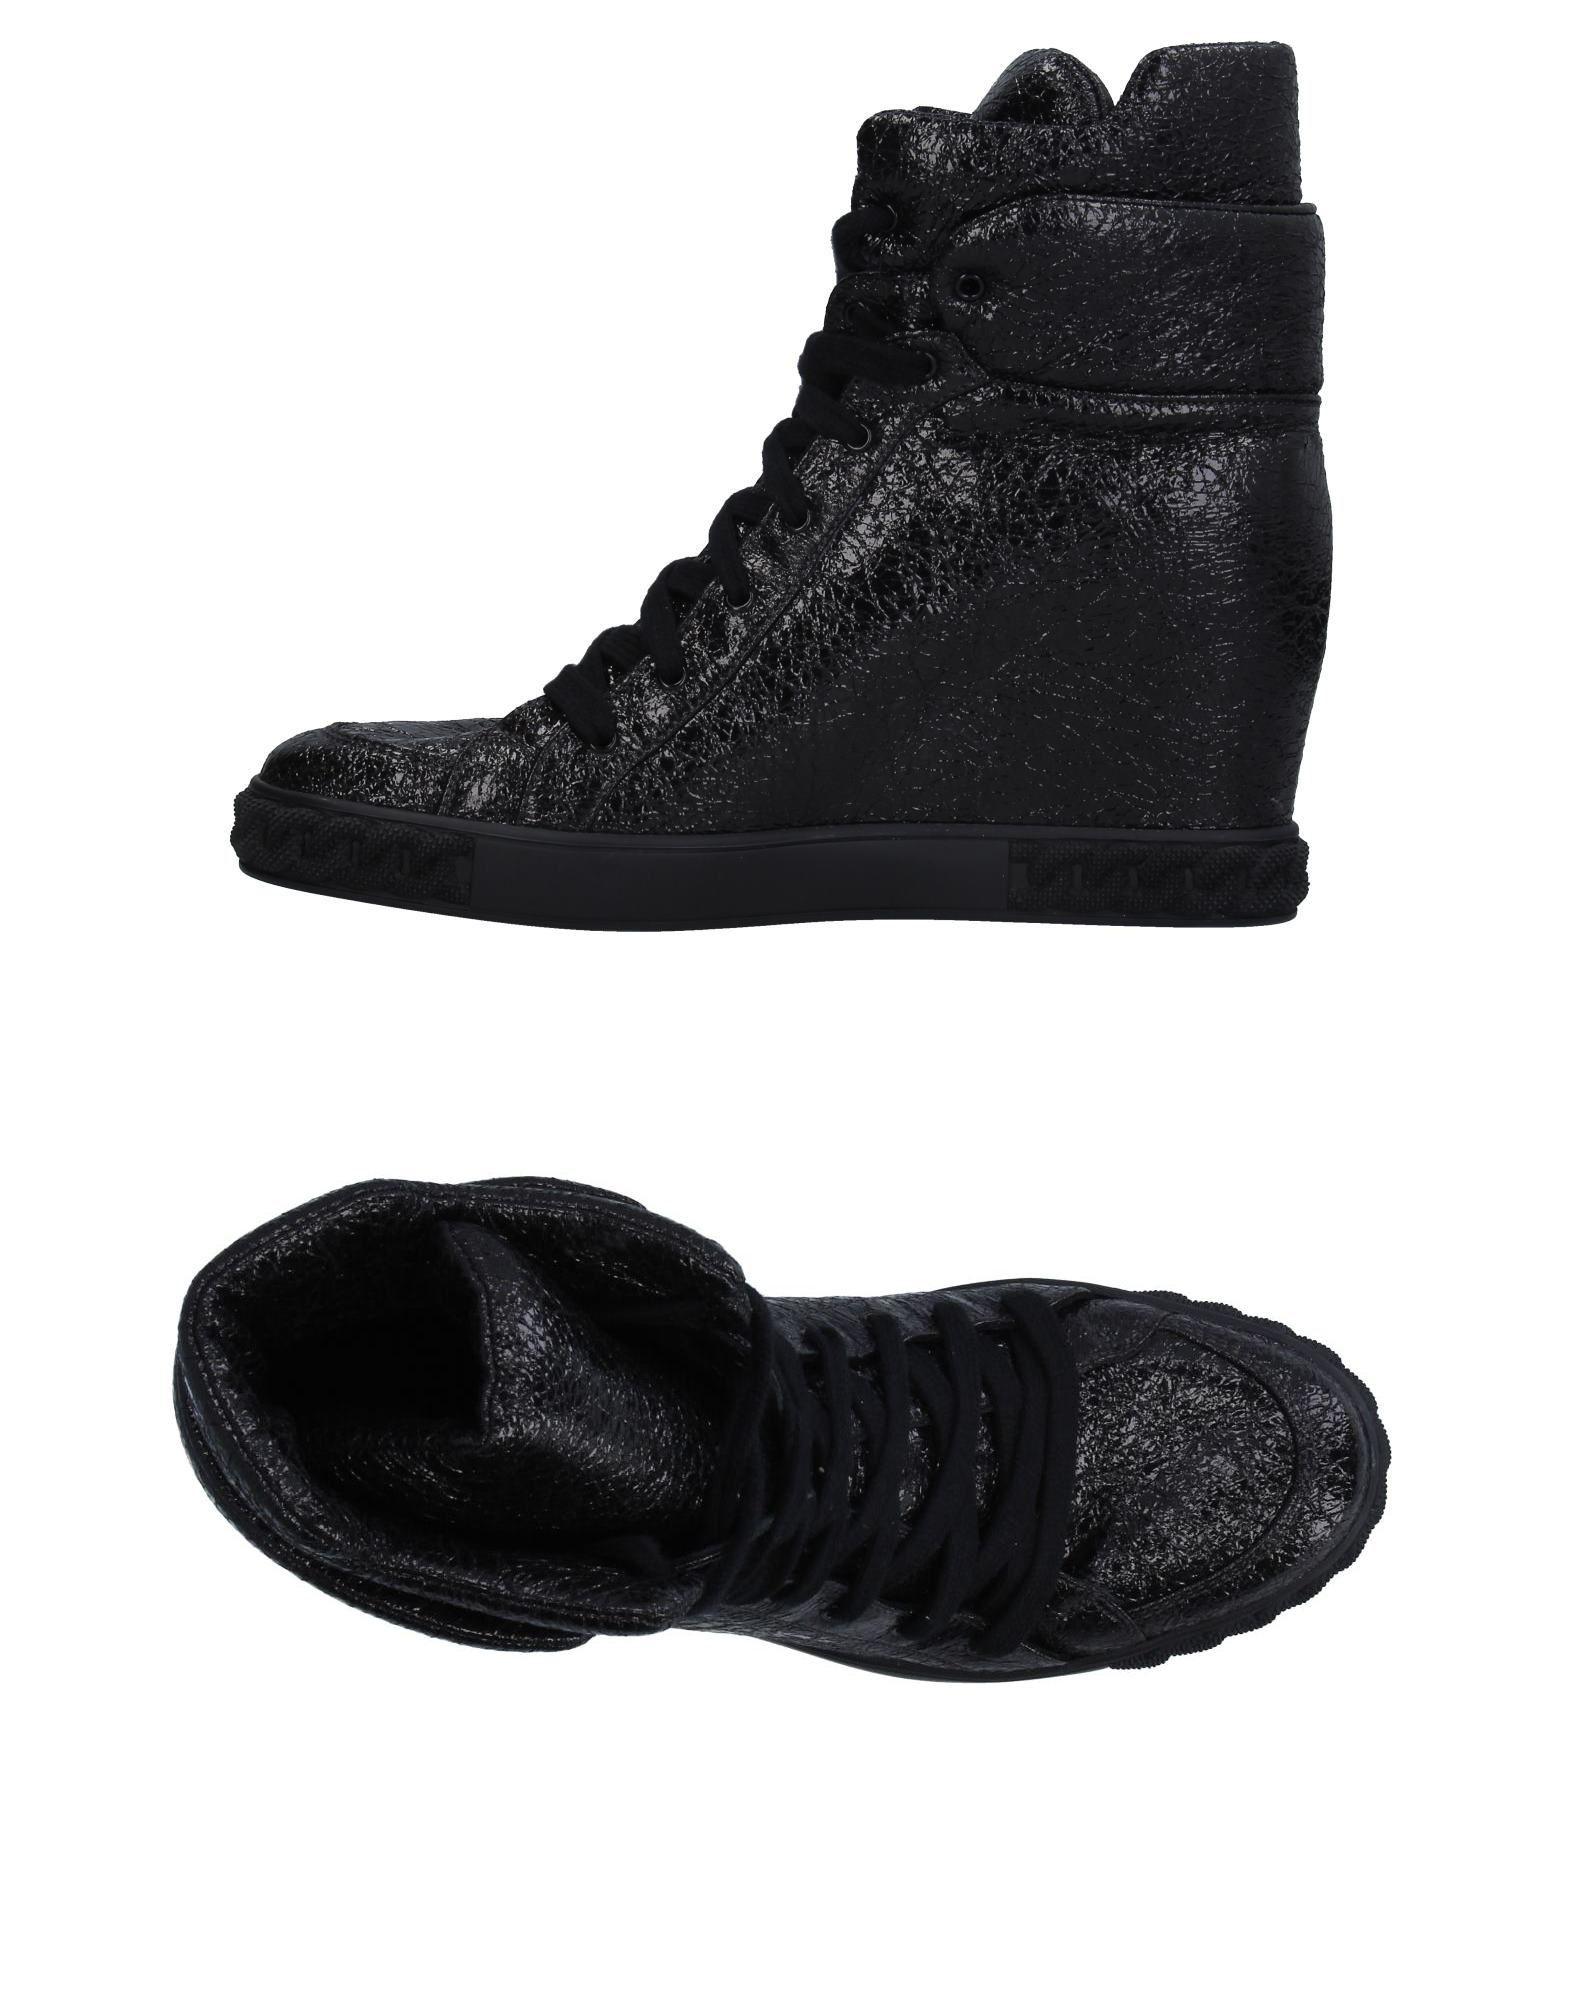 Casadei Sneakers -  Women Casadei Sneakers online on  - United Kingdom - 11329449OQ fc9b34